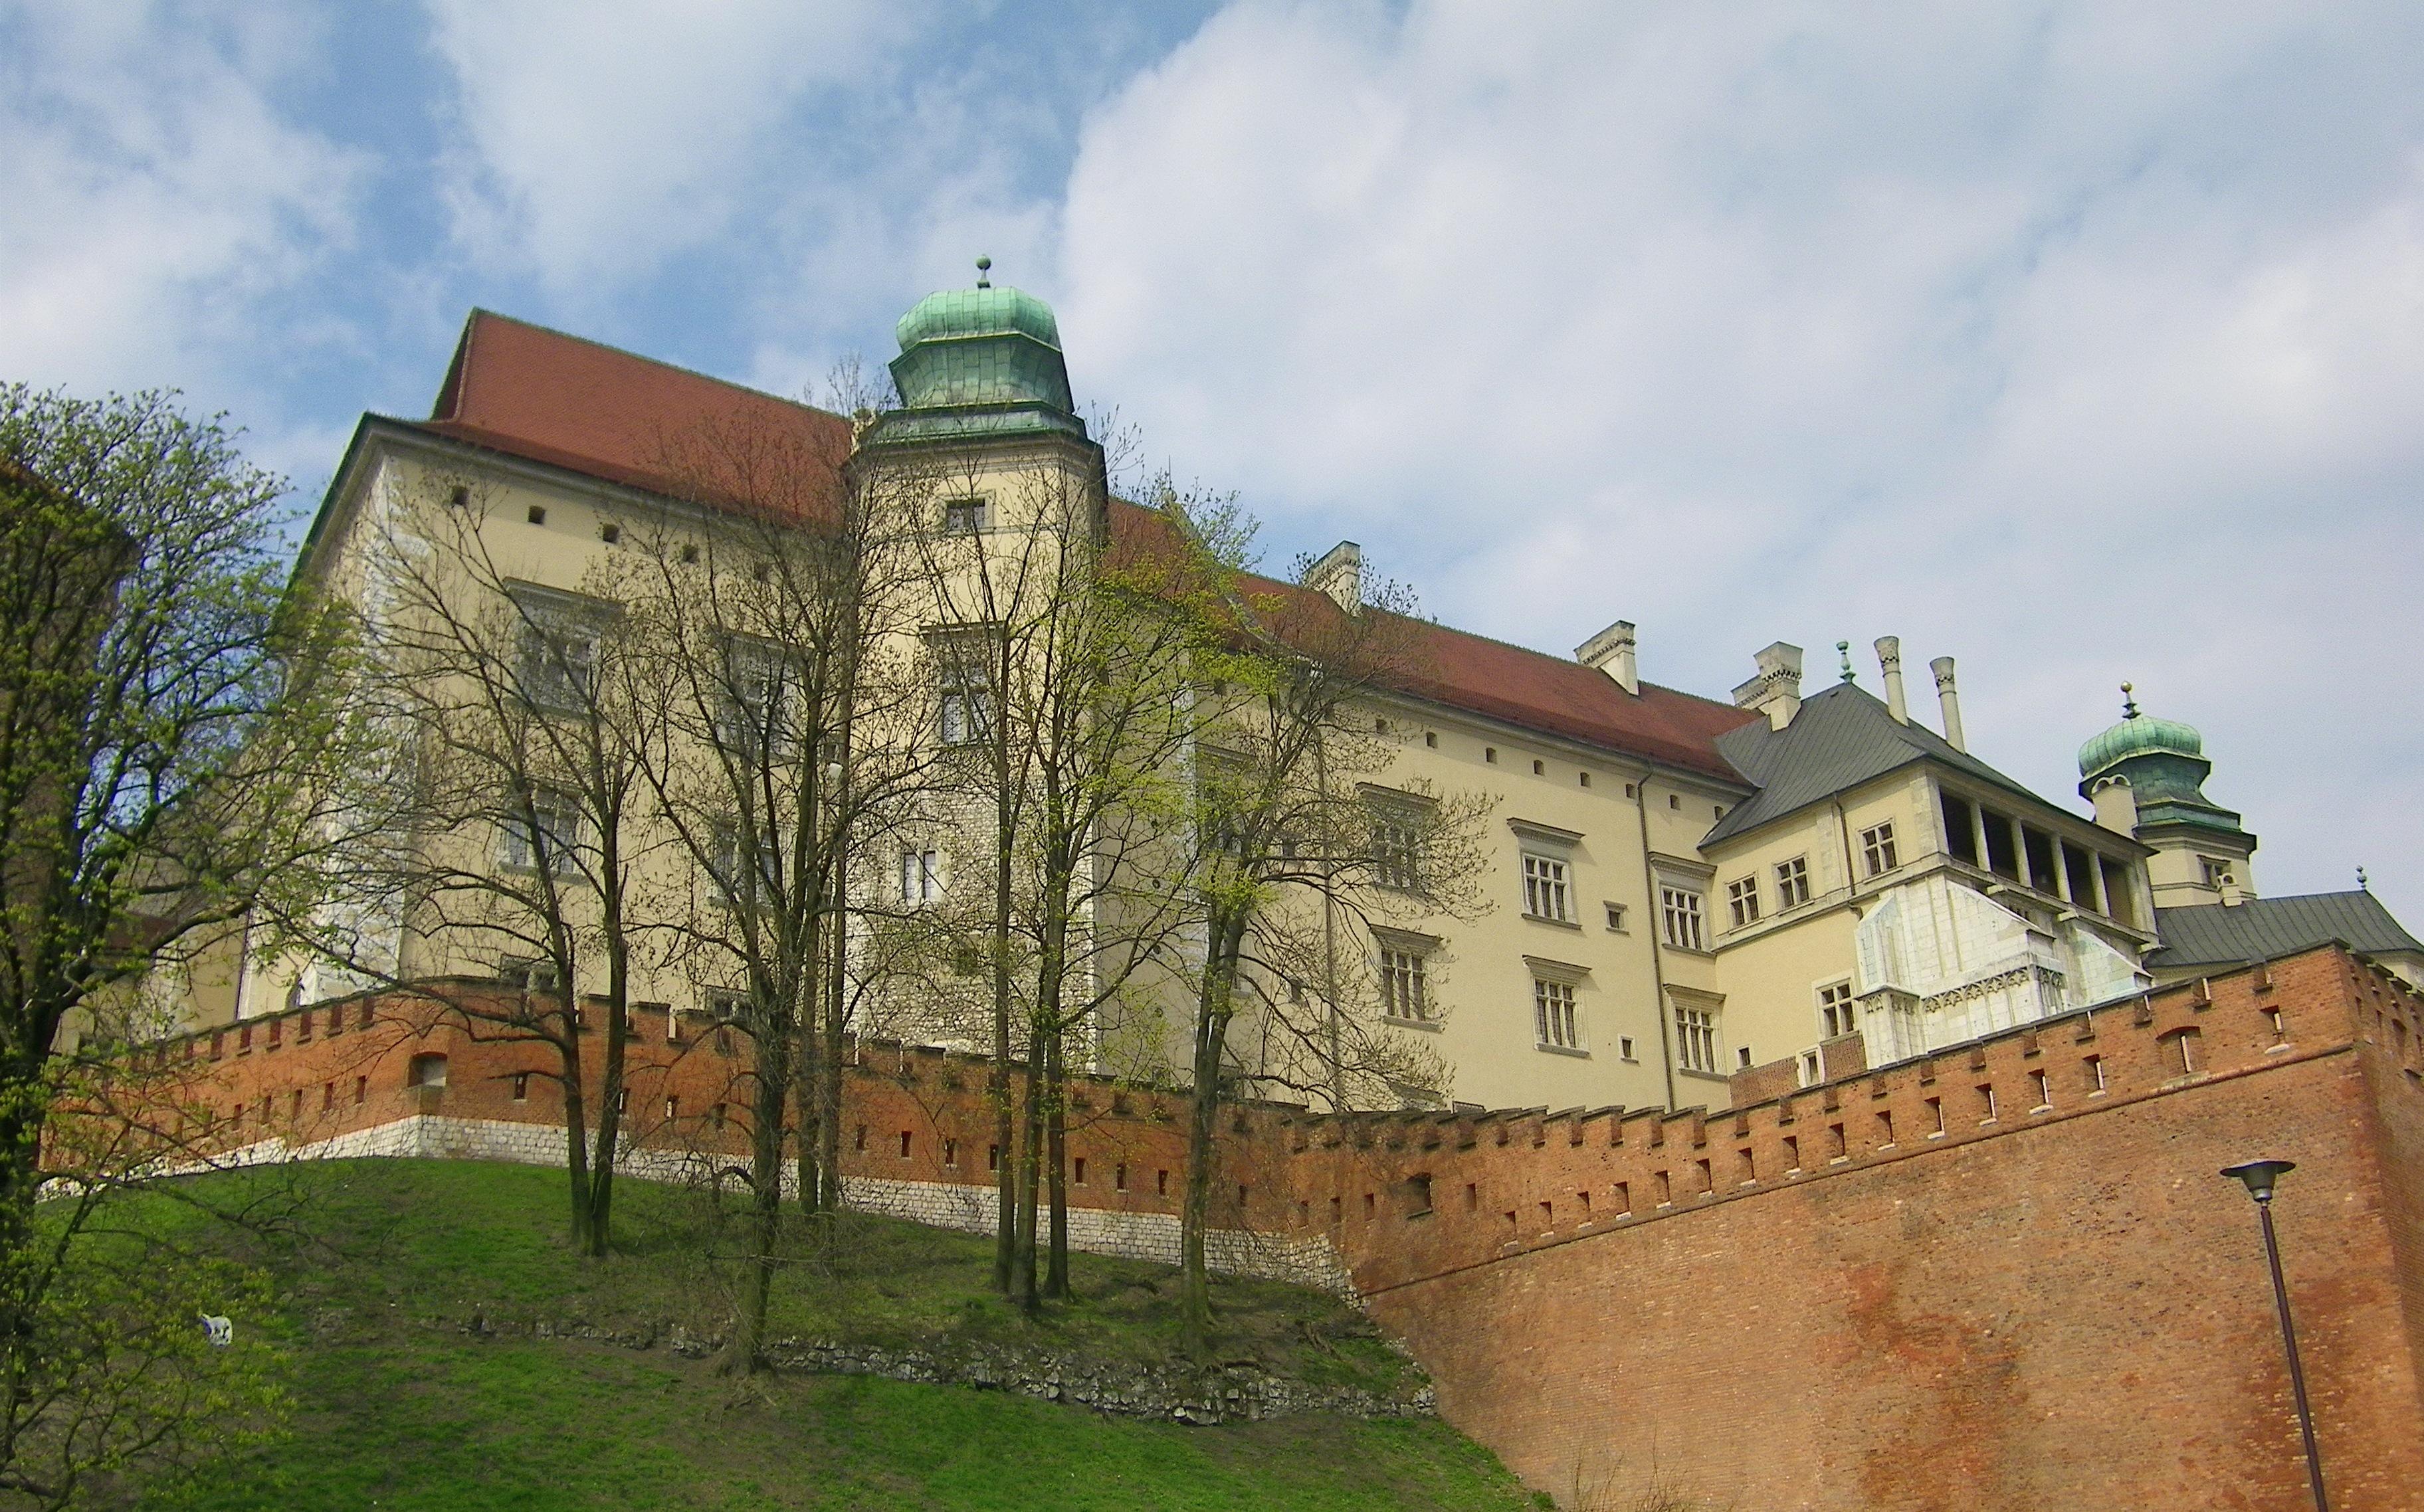 Cracovia, 9 - 12 Aprile 2011 133